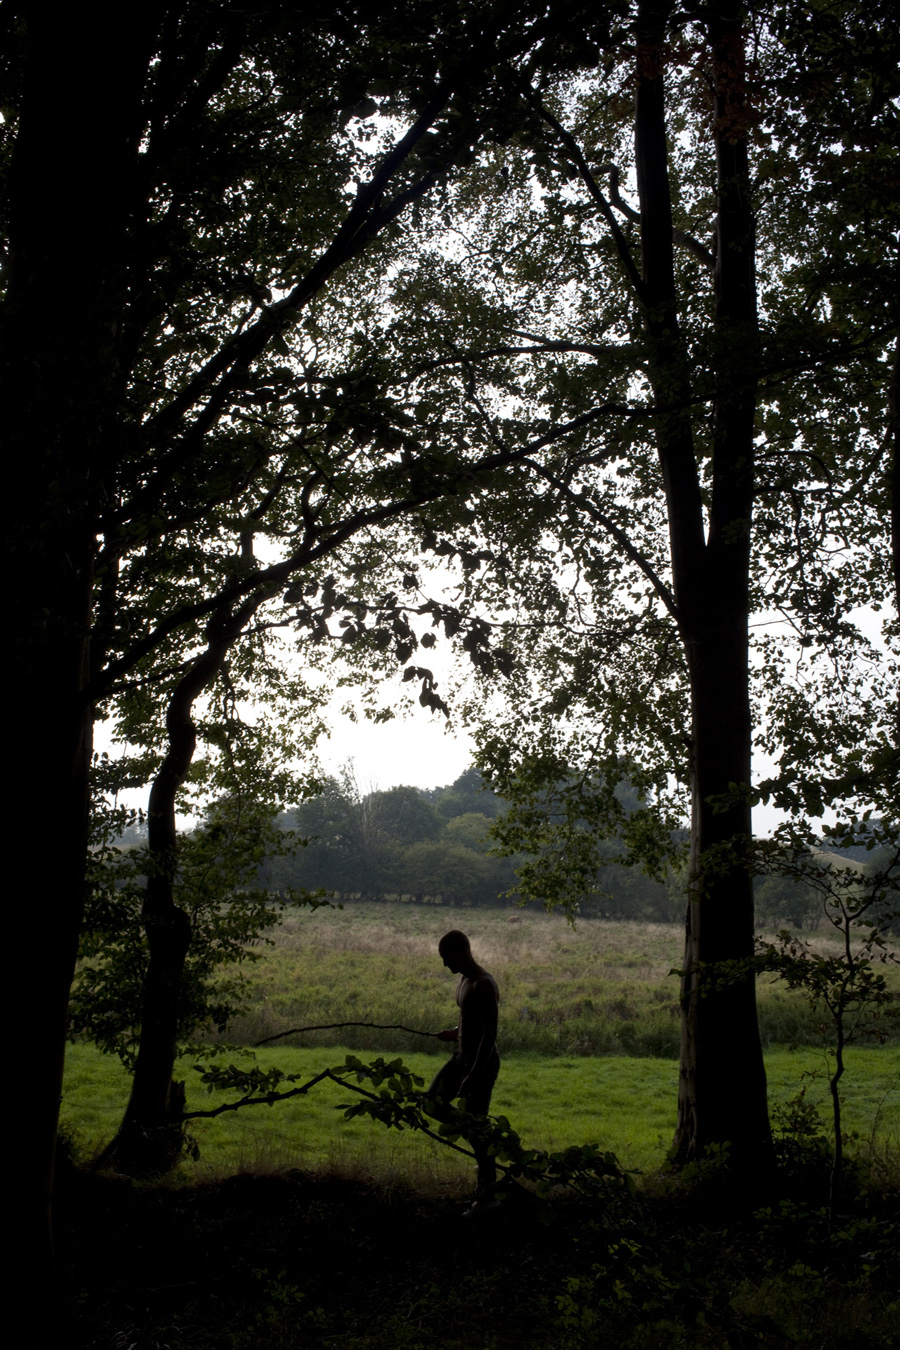 Daniel_van_Flymen_FOREST_011_1.jpg